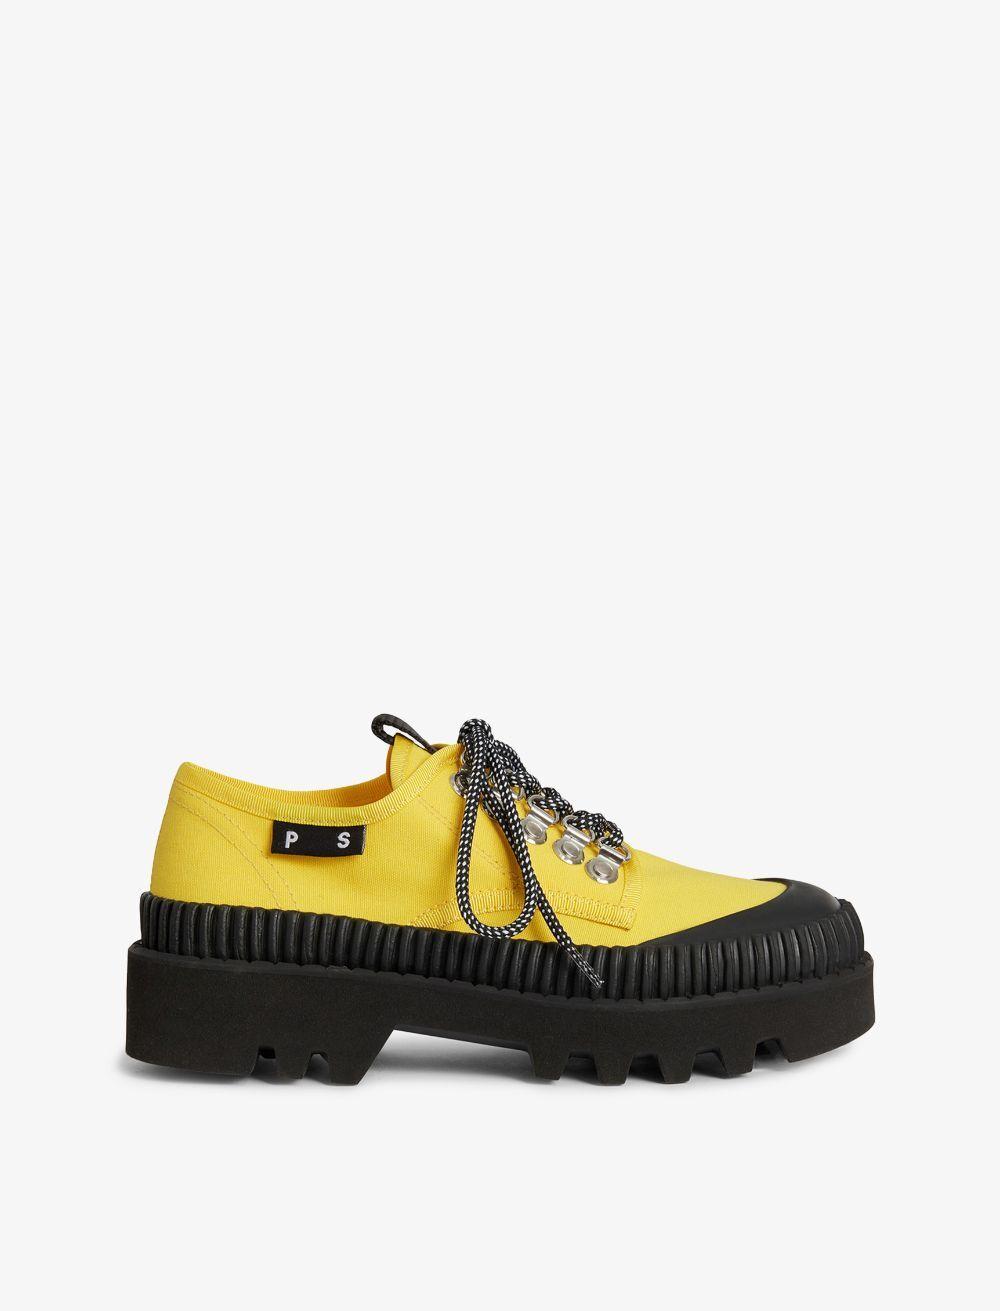 Proenza Schouler City Lug Sole Shoes 206 yellow 39